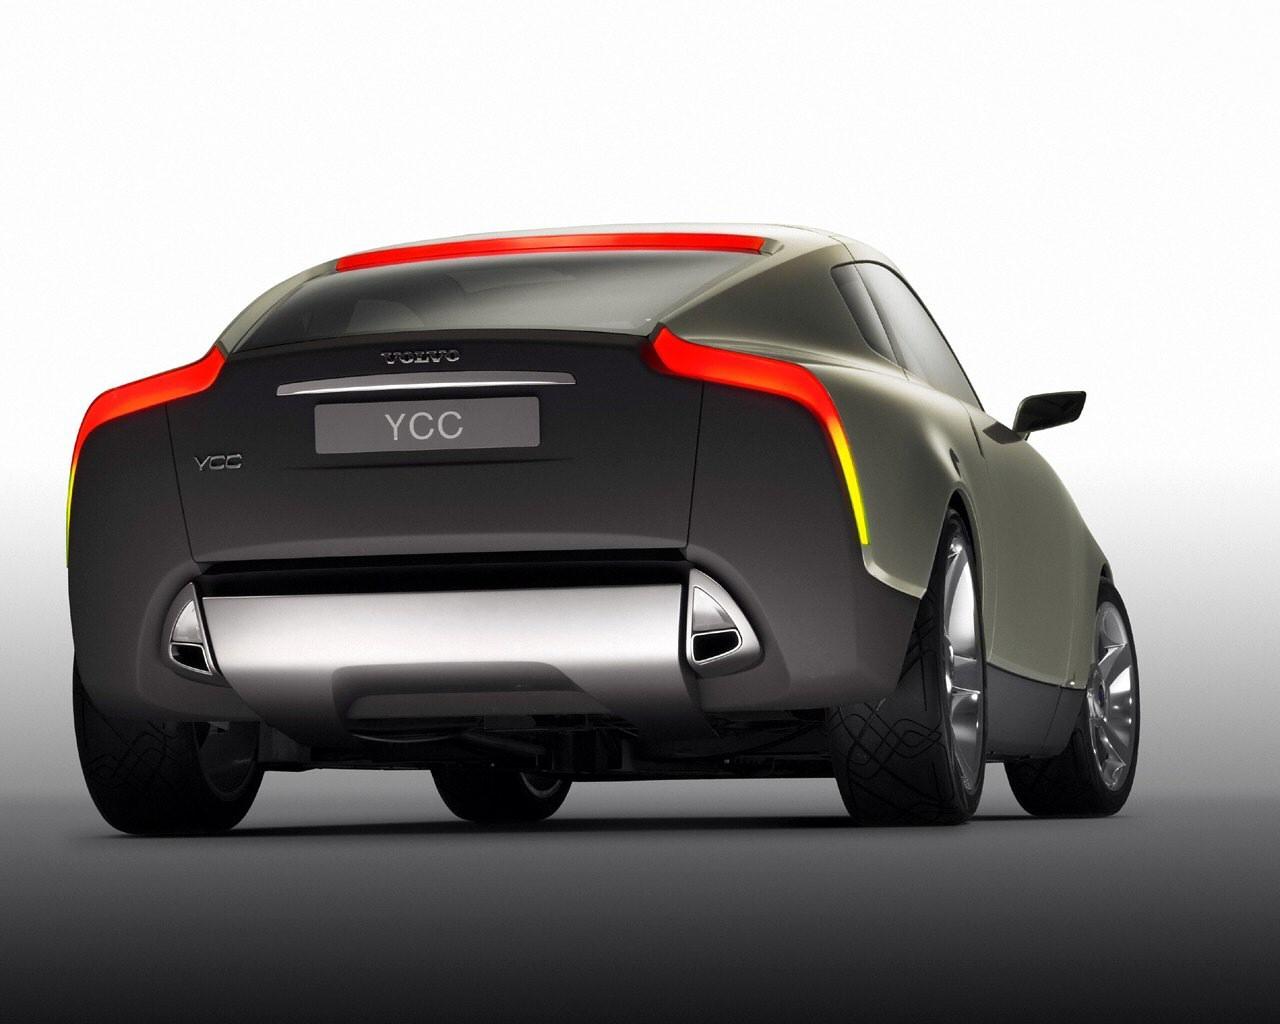 Volvo YCC Concept Car (2004)